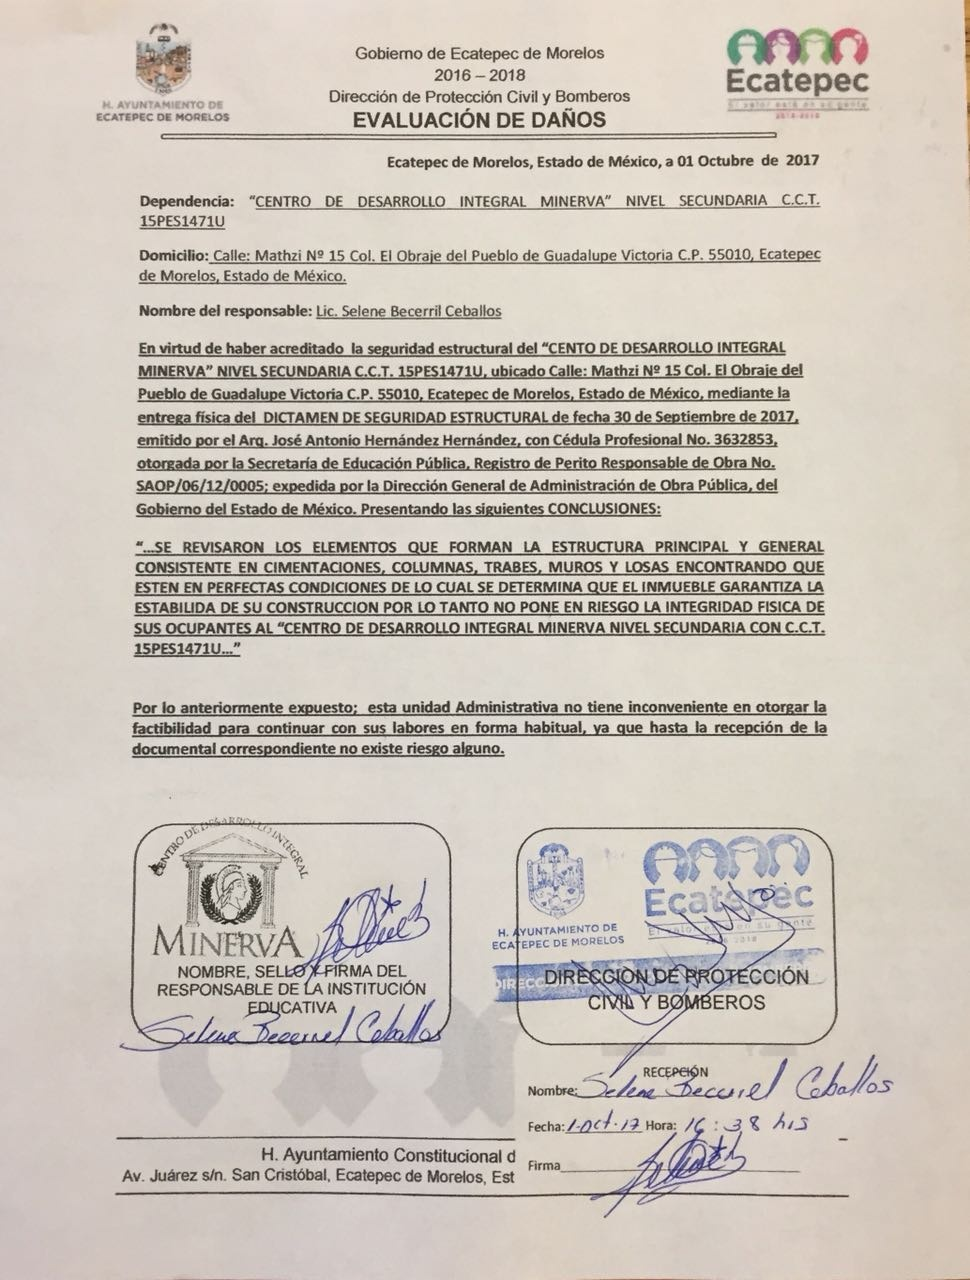 CENTRO DE DESARROLLO INTEGRAL MINERVA - Avisos